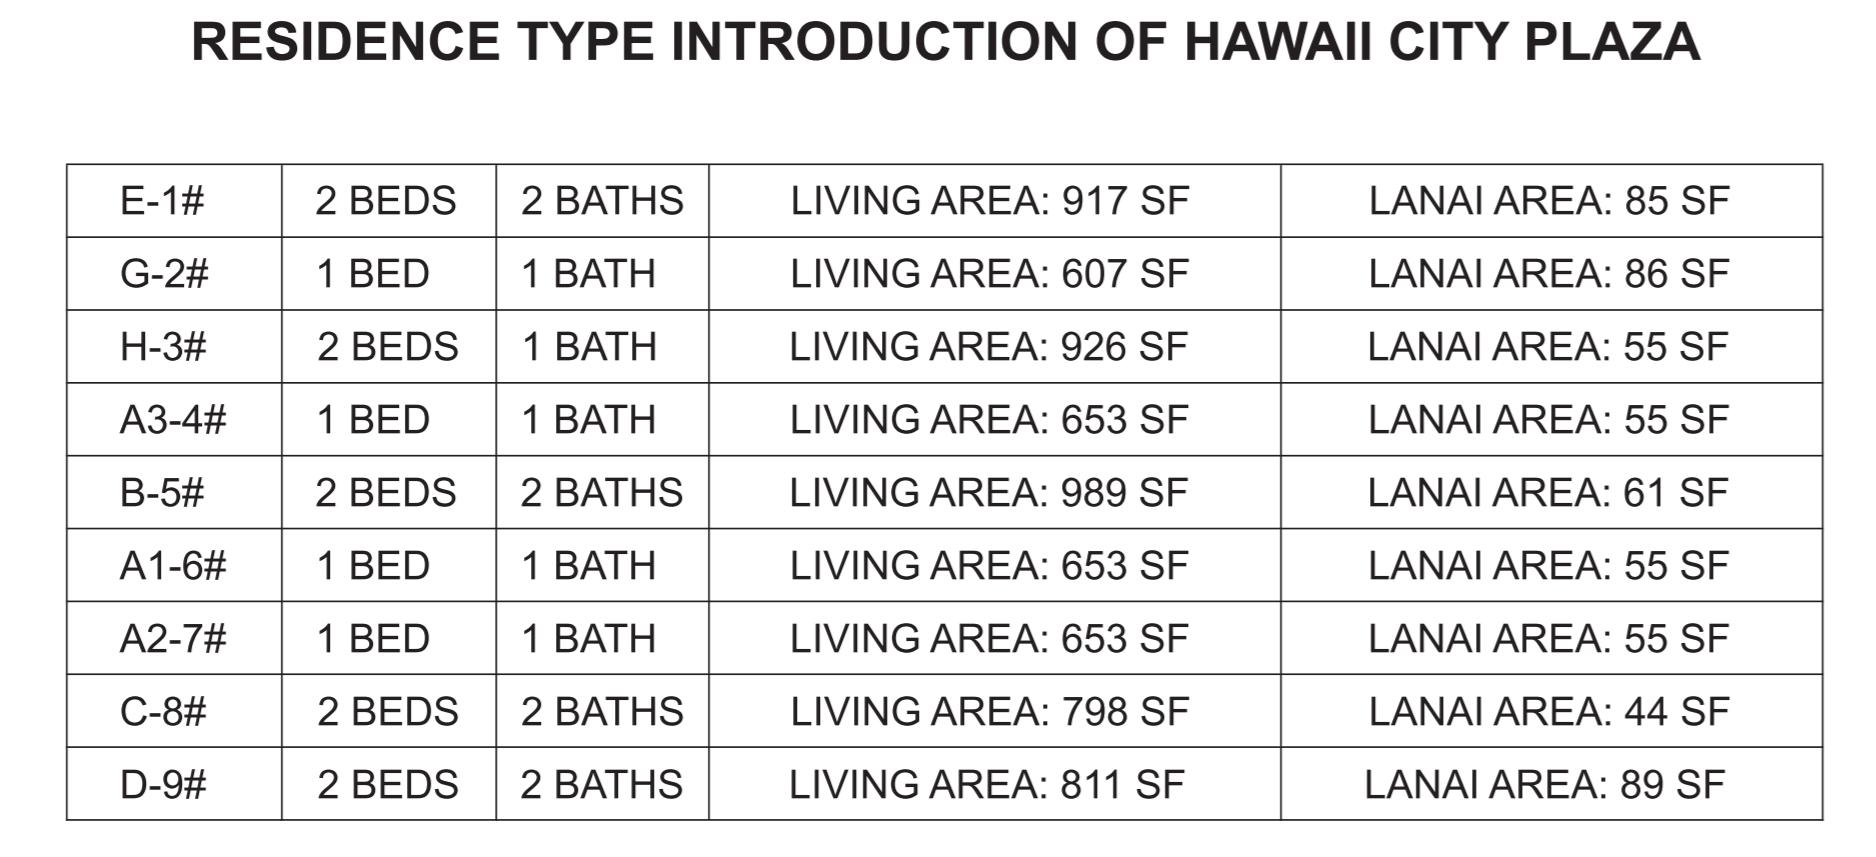 Hawaii City Plaza Floorplans